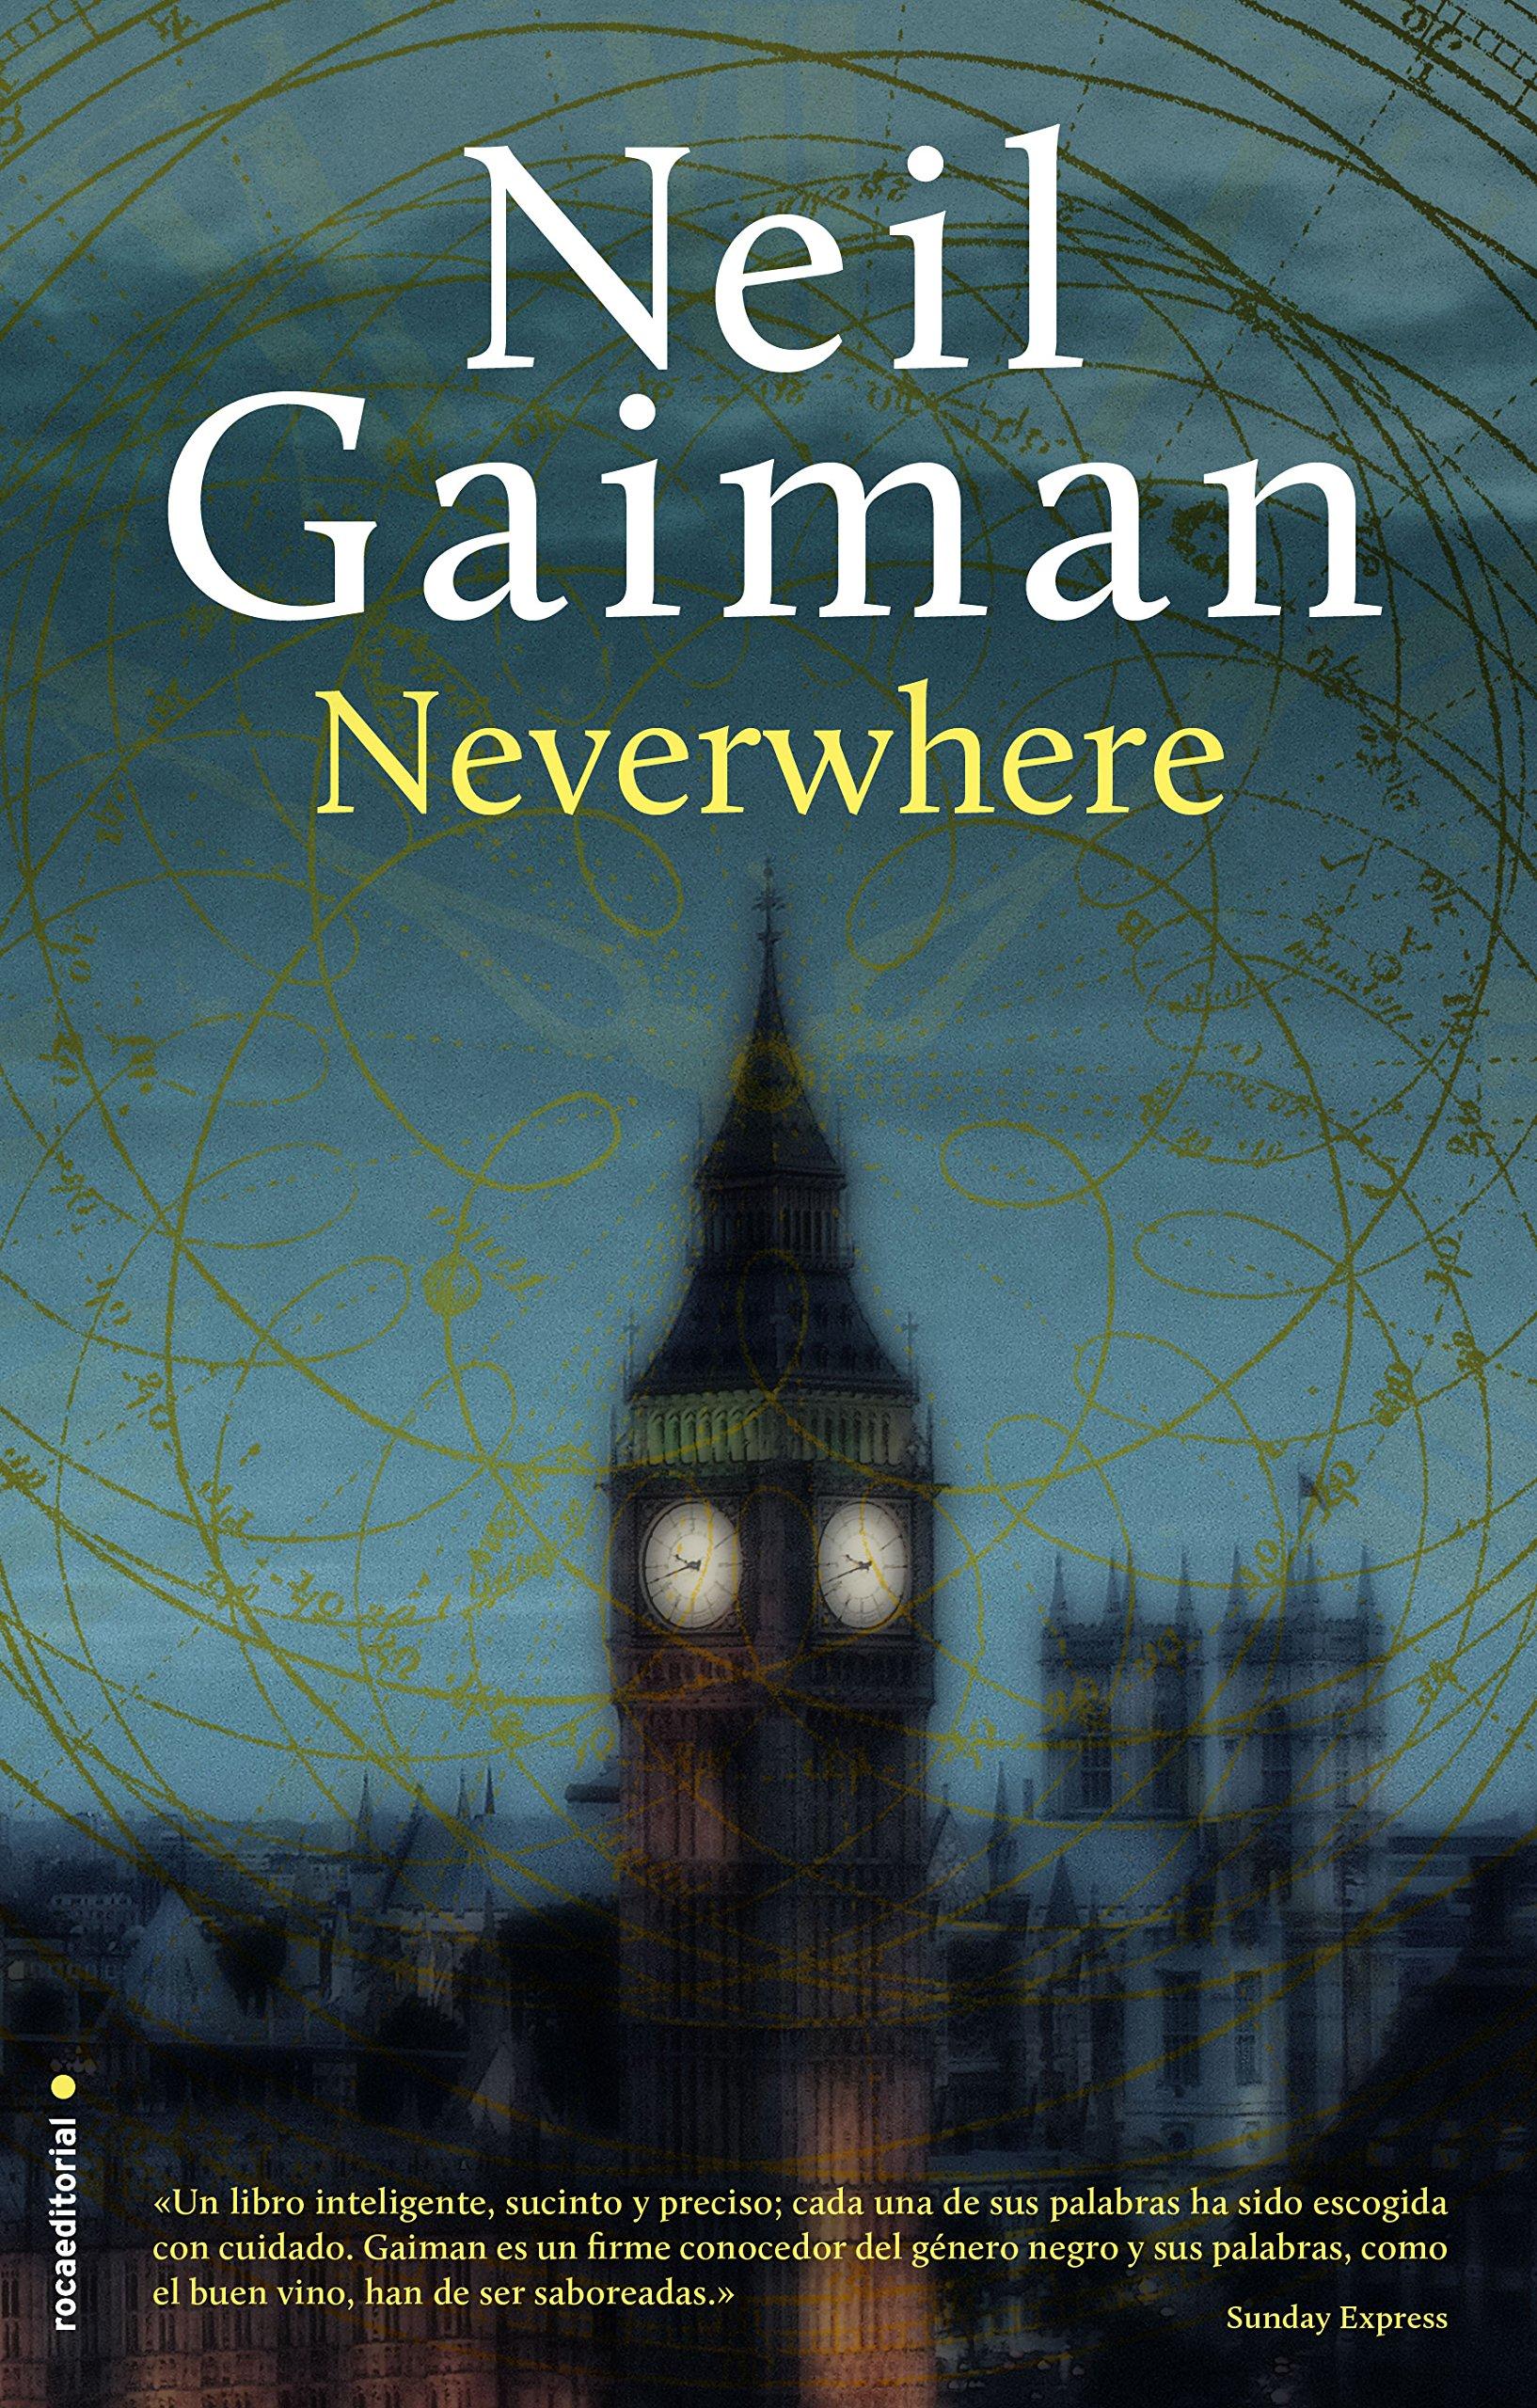 Neverwhere (Novela (roca)) Tapa dura – 15 oct 2015 Neil Gaiman Mónica Faerna Roca Editorial 8499189520